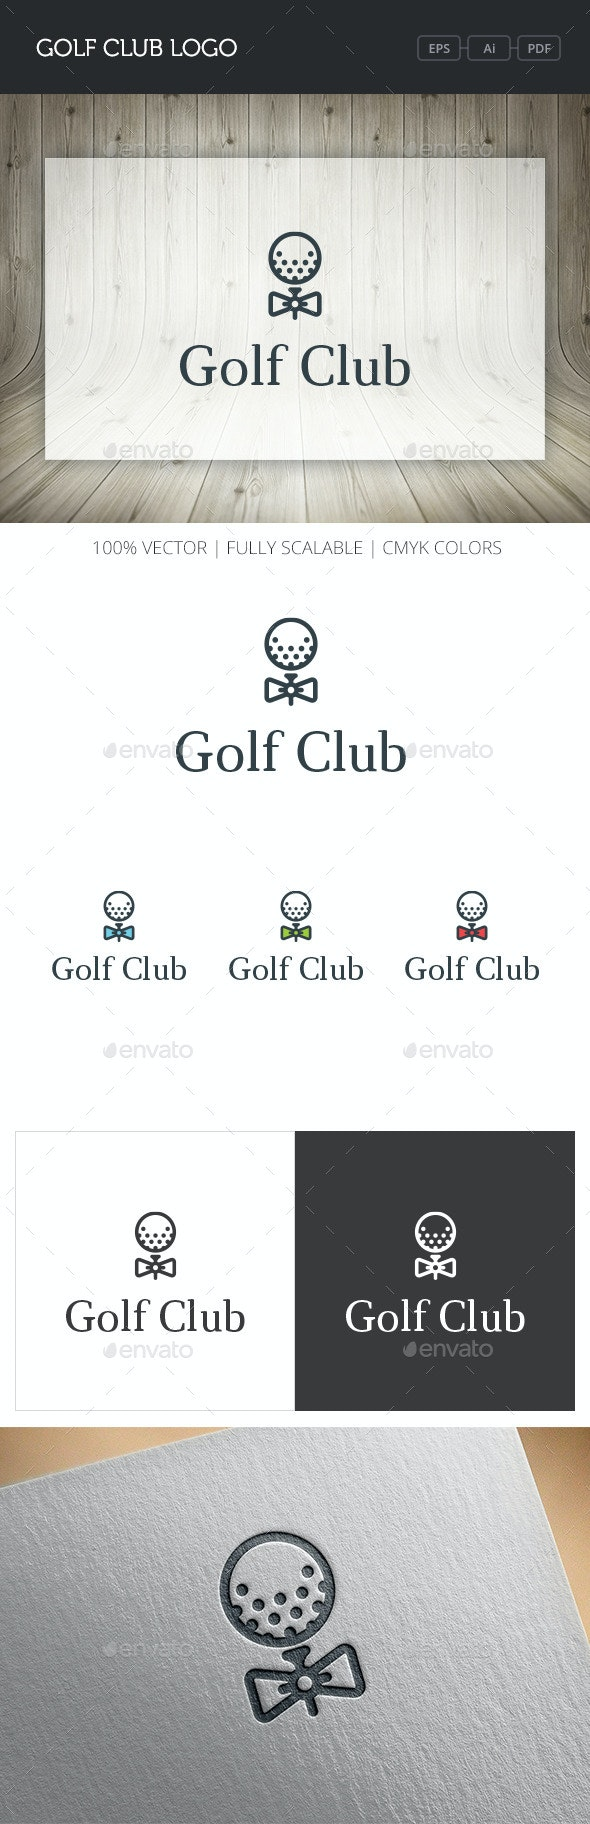 Golf Club Logo - Objects Logo Templates